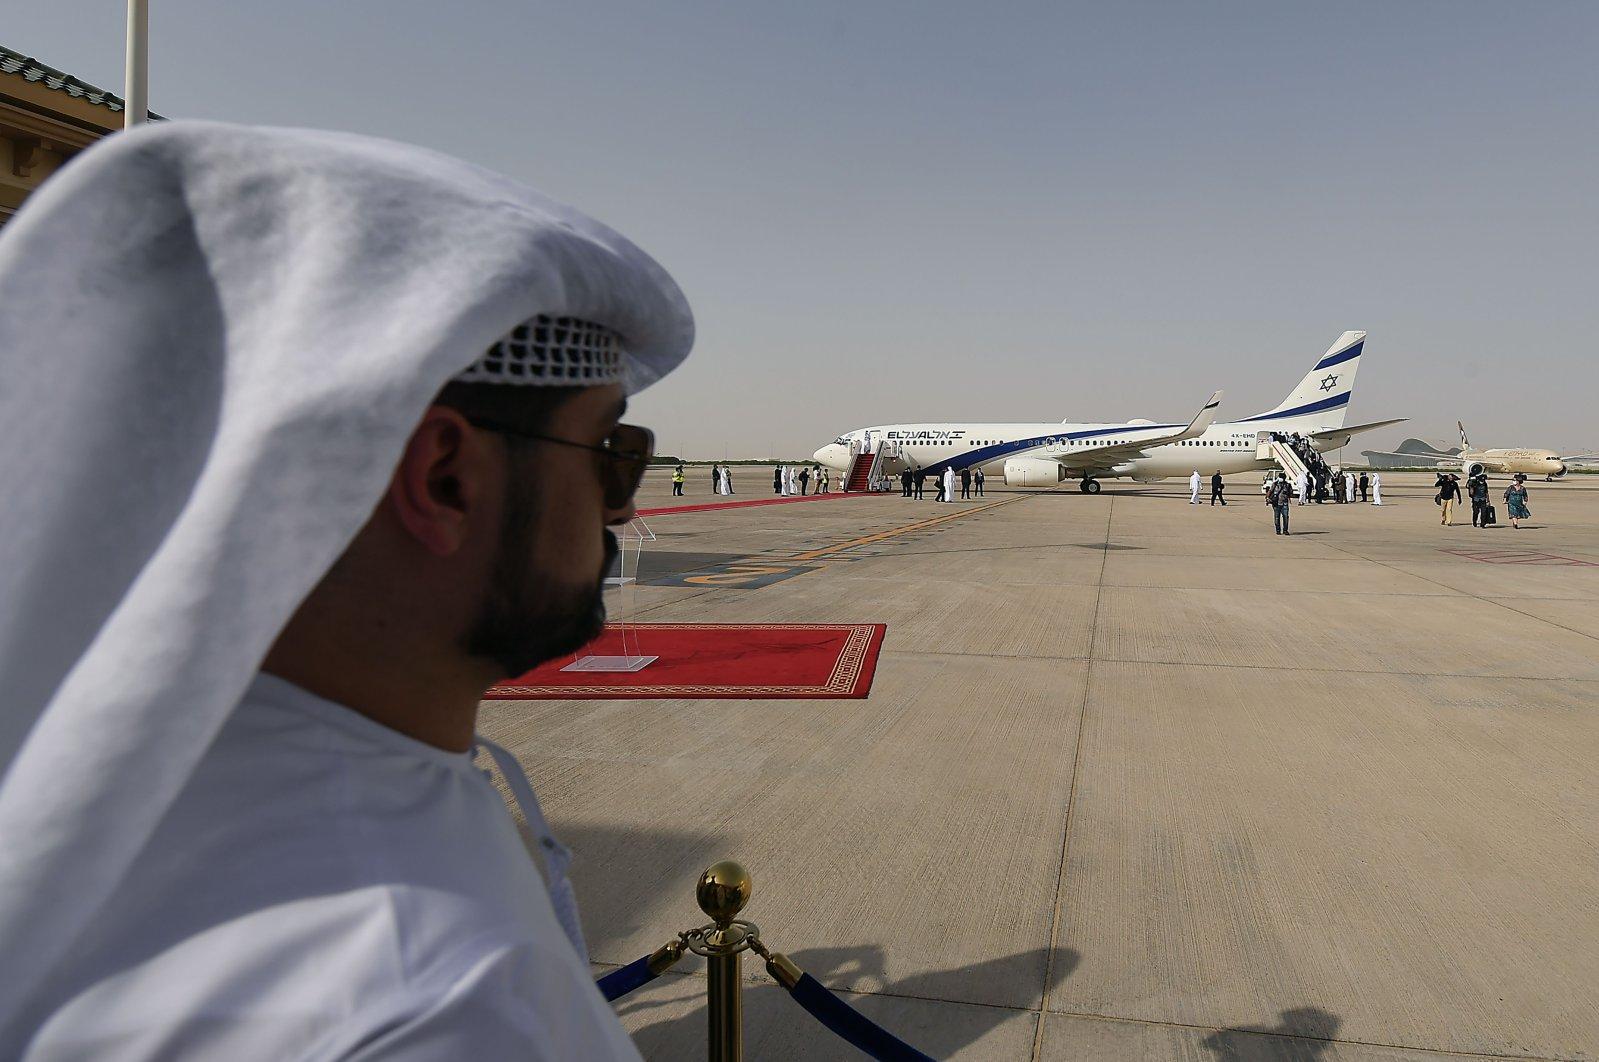 El Al's airliner, carrying a U.S.-Israeli delegation, lands on the tarmac at the Abu Dhabi International Airport, Abu Dhabi, United Arab Emirates, Aug. 31, 2020. (AFP Photo)